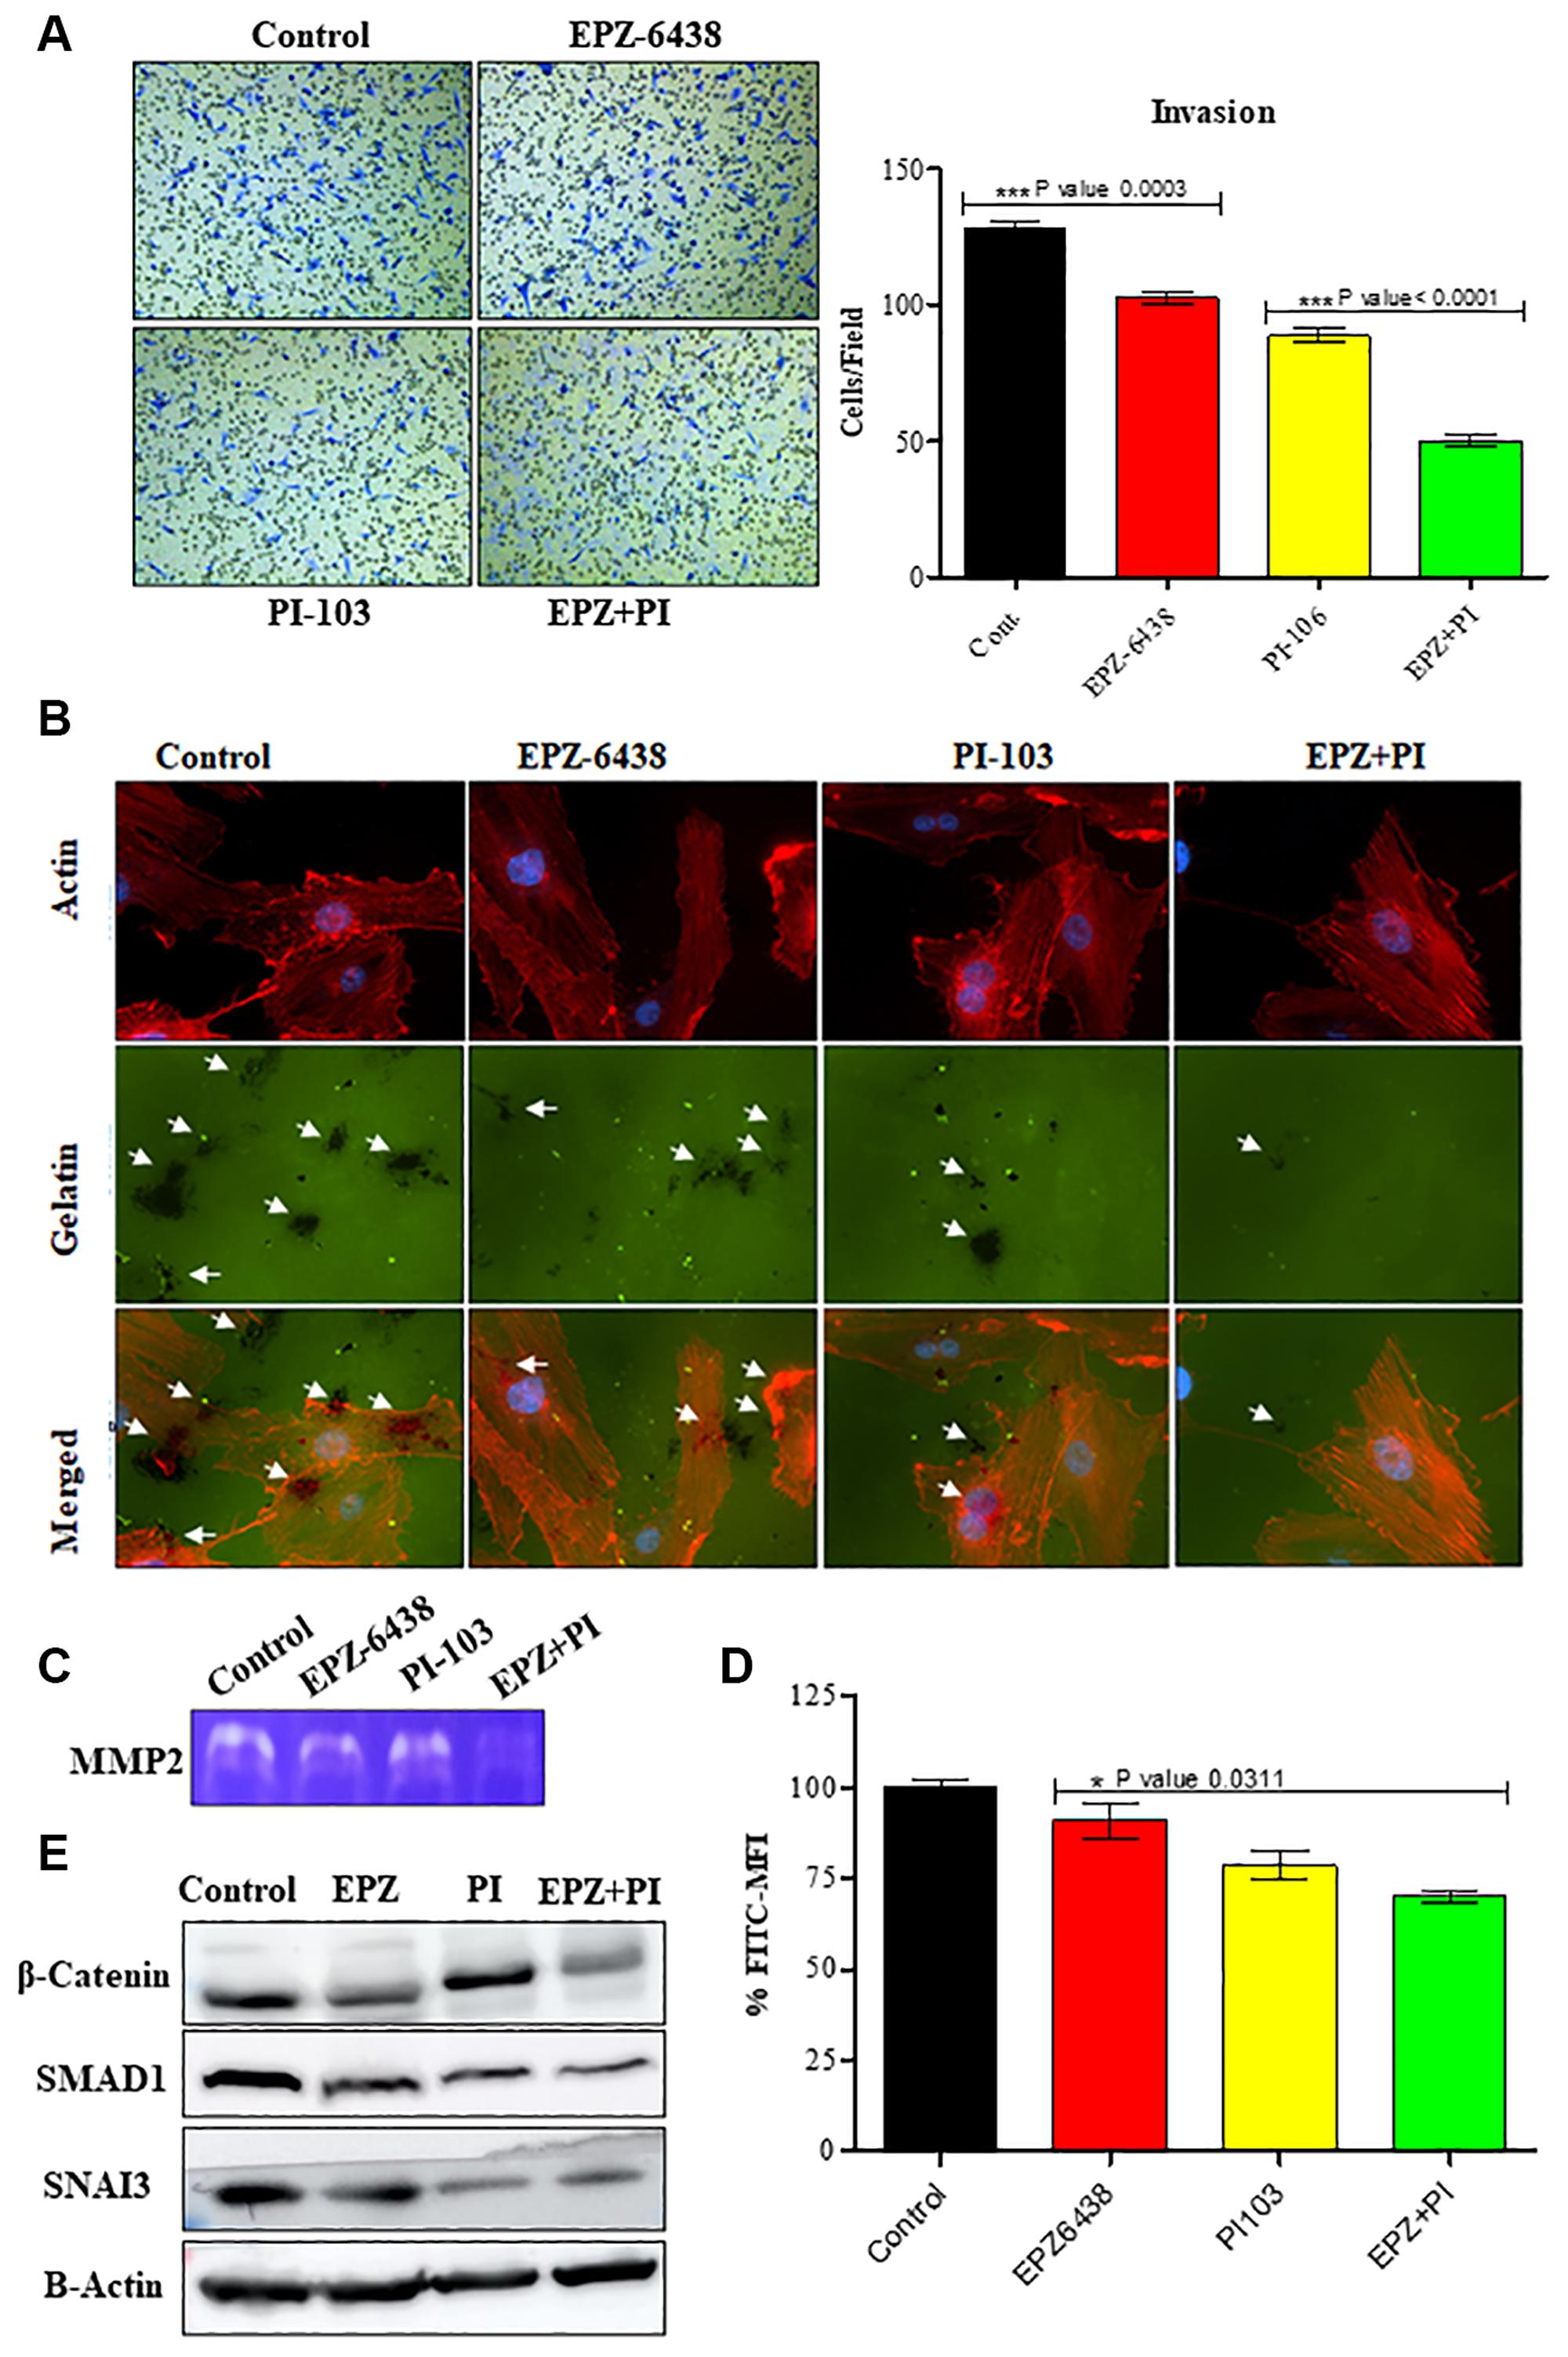 EPZ-6438 and PI-103 reduces the invasive behavior of GBM U-87 cells.